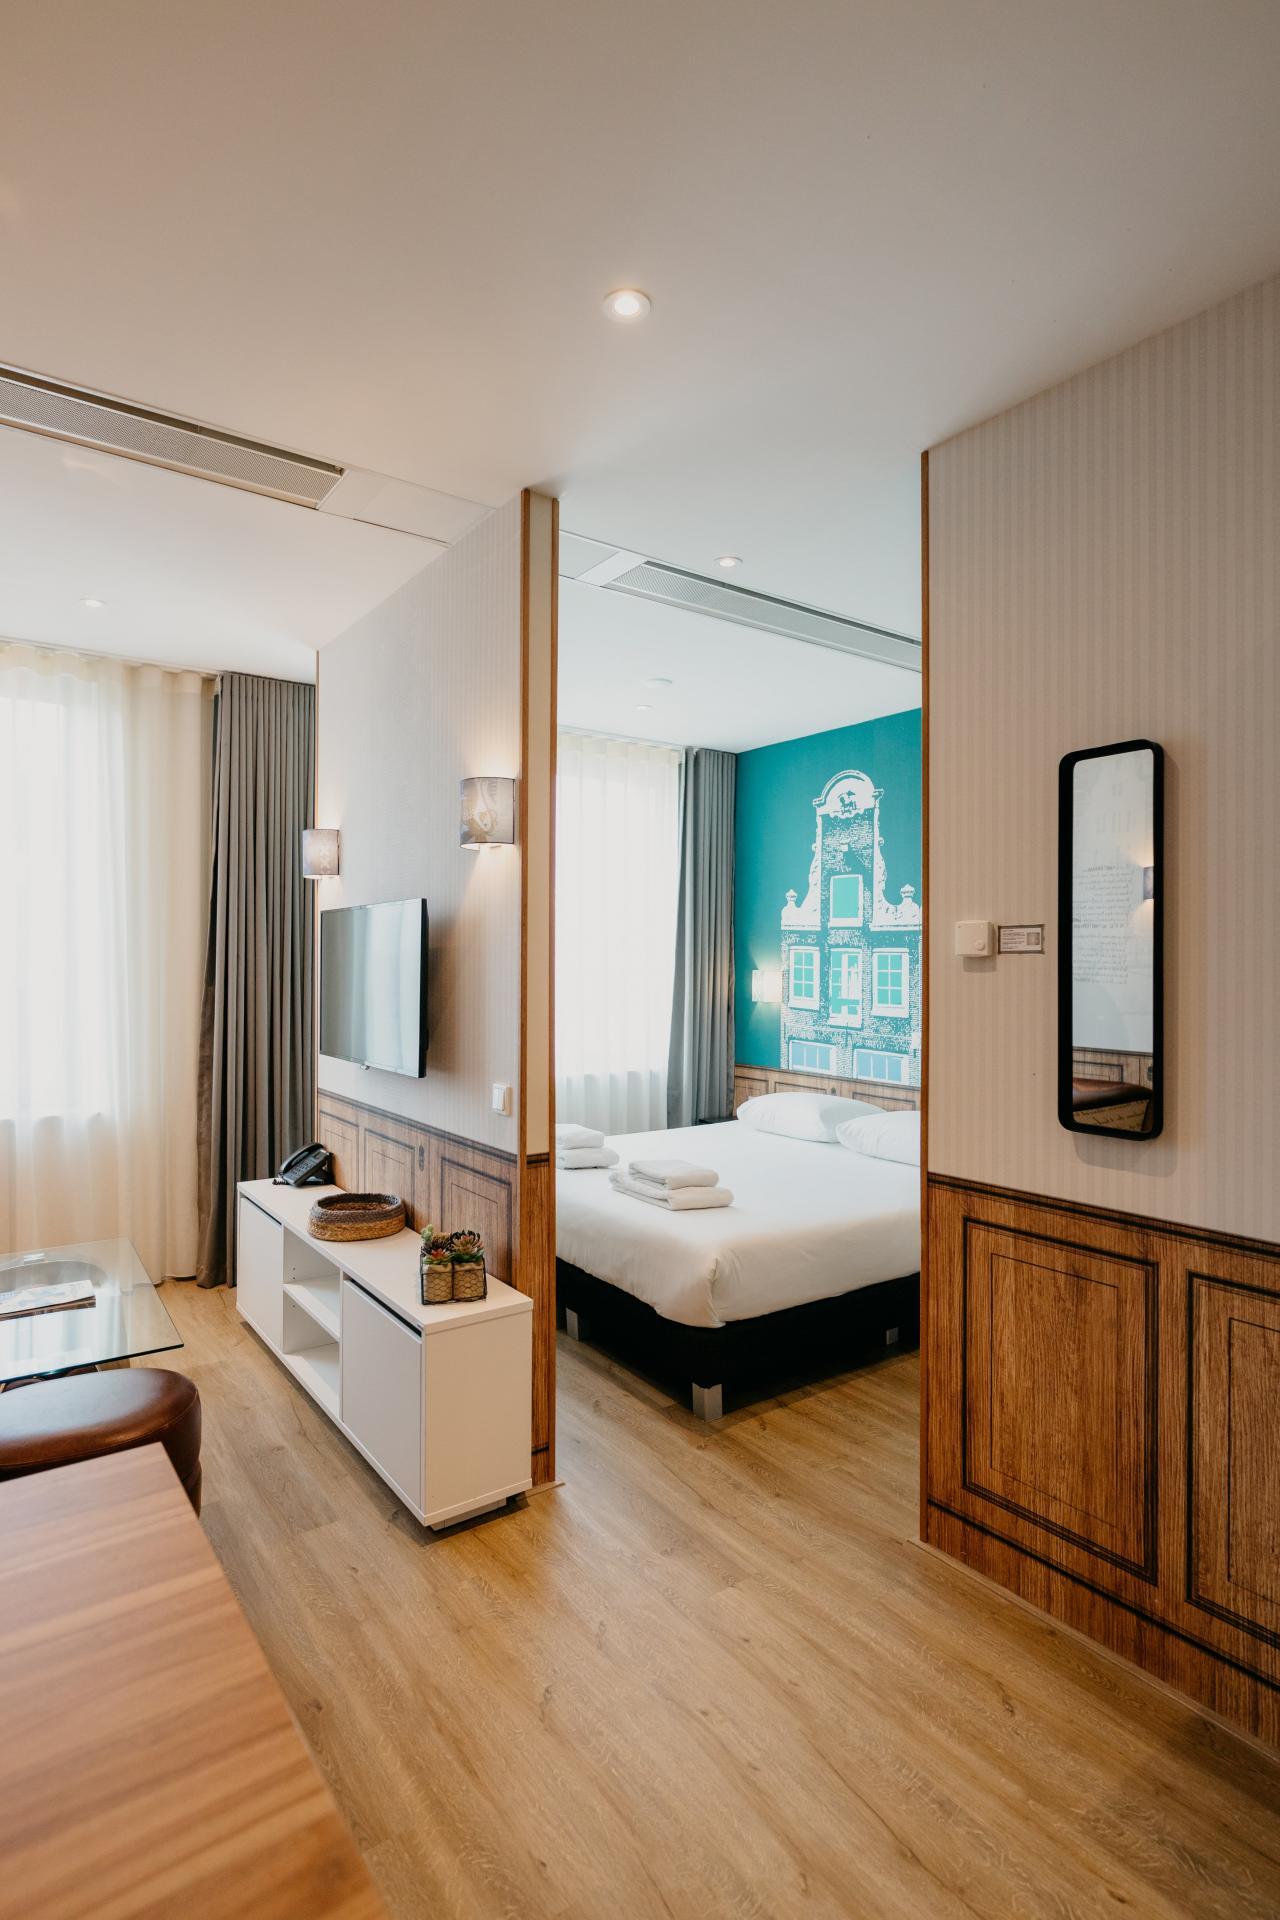 Bed at Amsterdam ID Aparthotel, Sloterdijk, Amsterdam